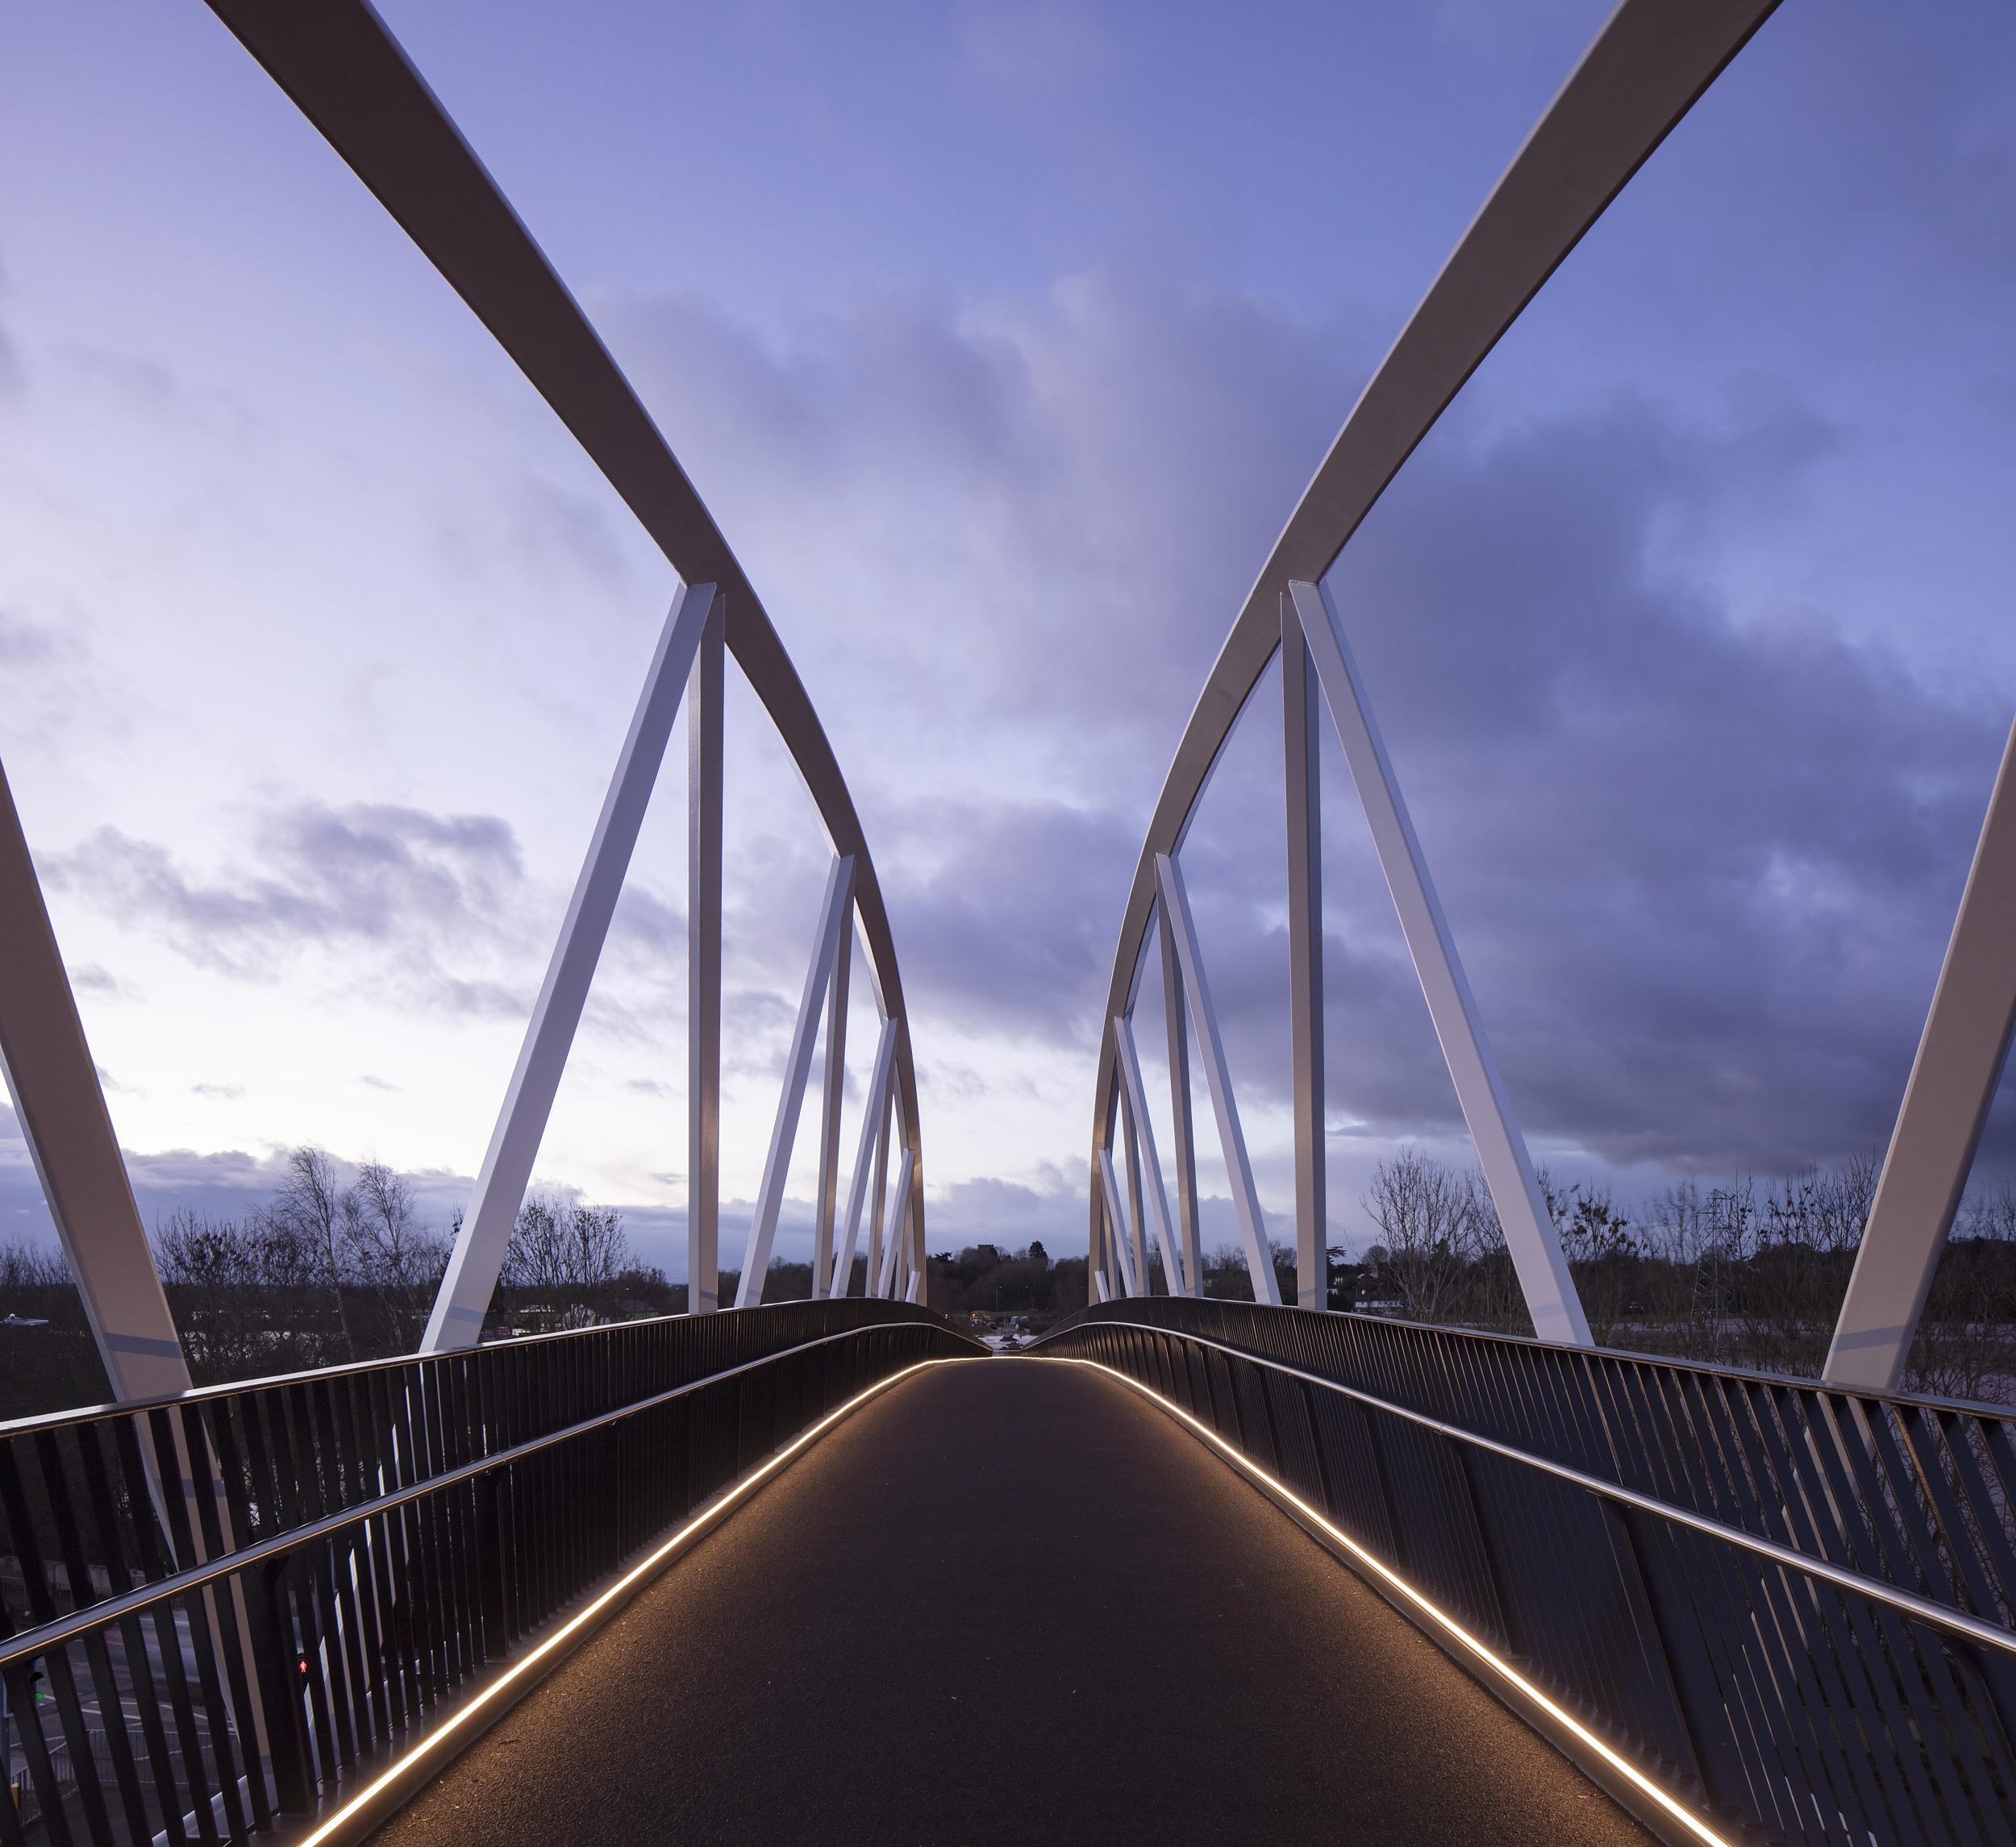 The bridge design creates a memorable experience of crossing it.